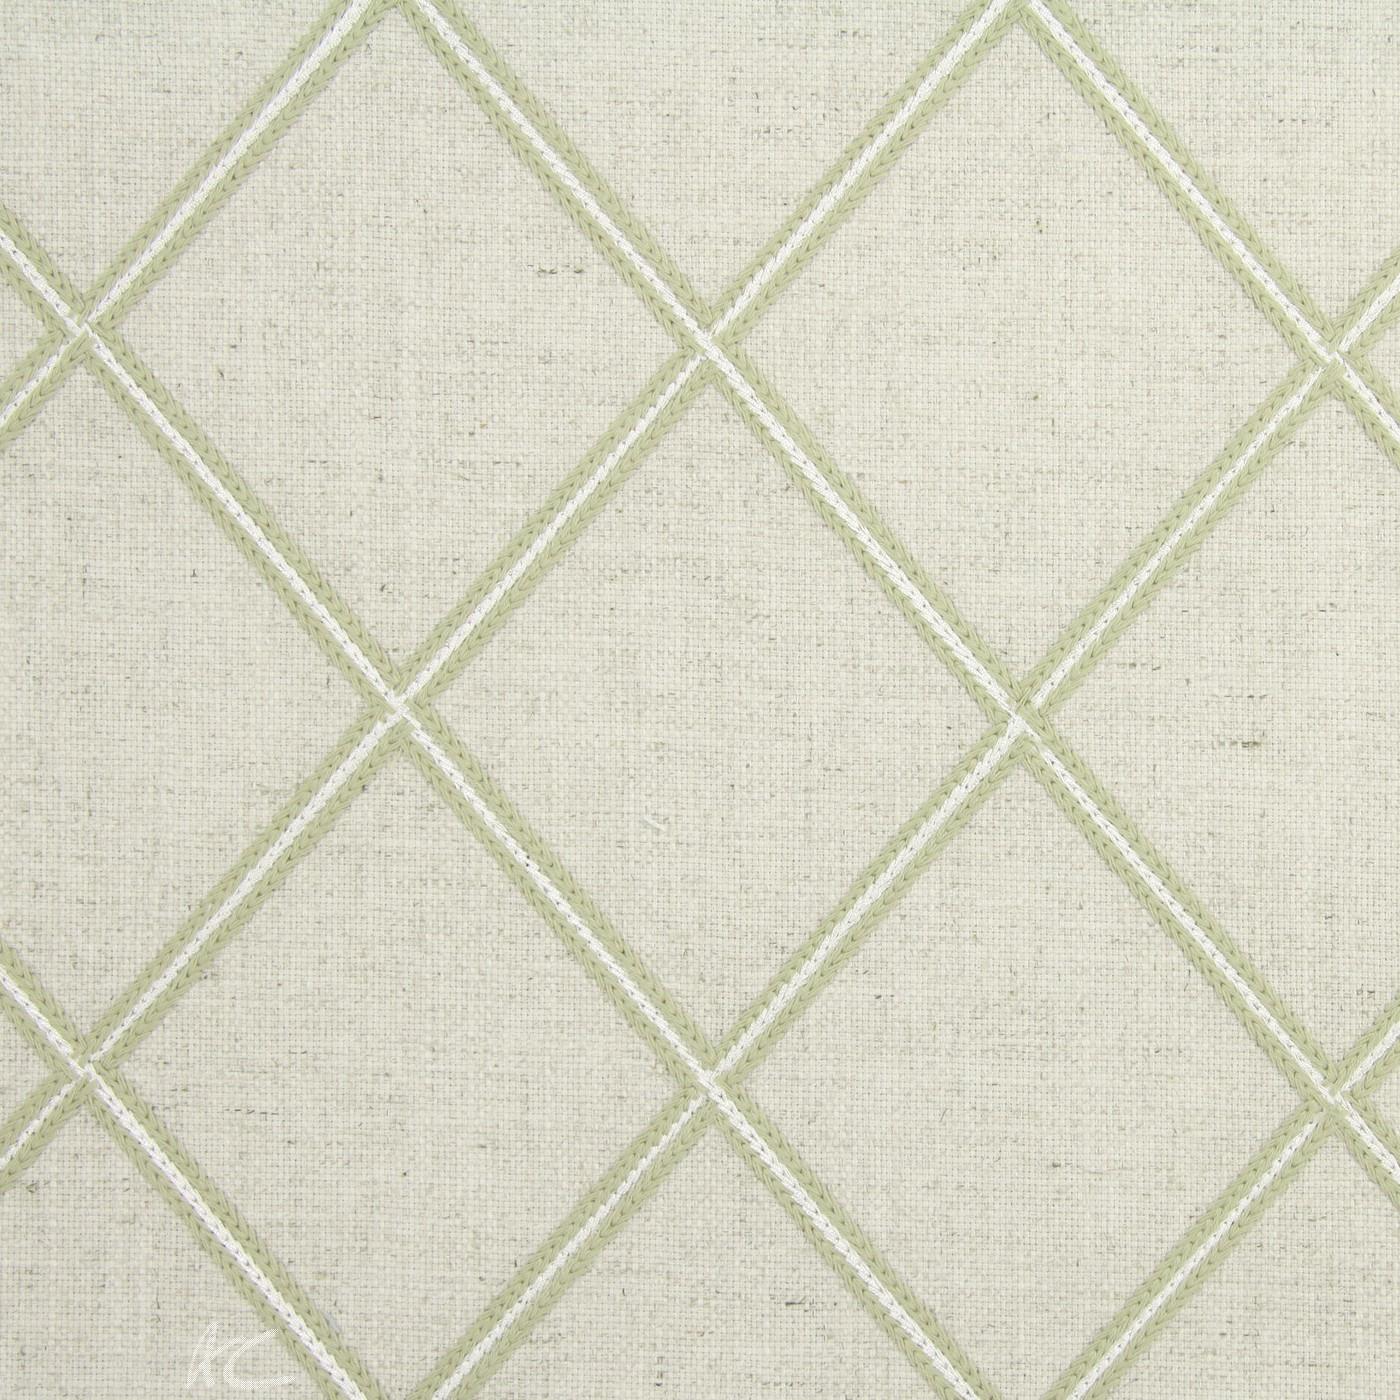 Prestigious Textiles Andiamo Lorenza Avocado Cushion Covers